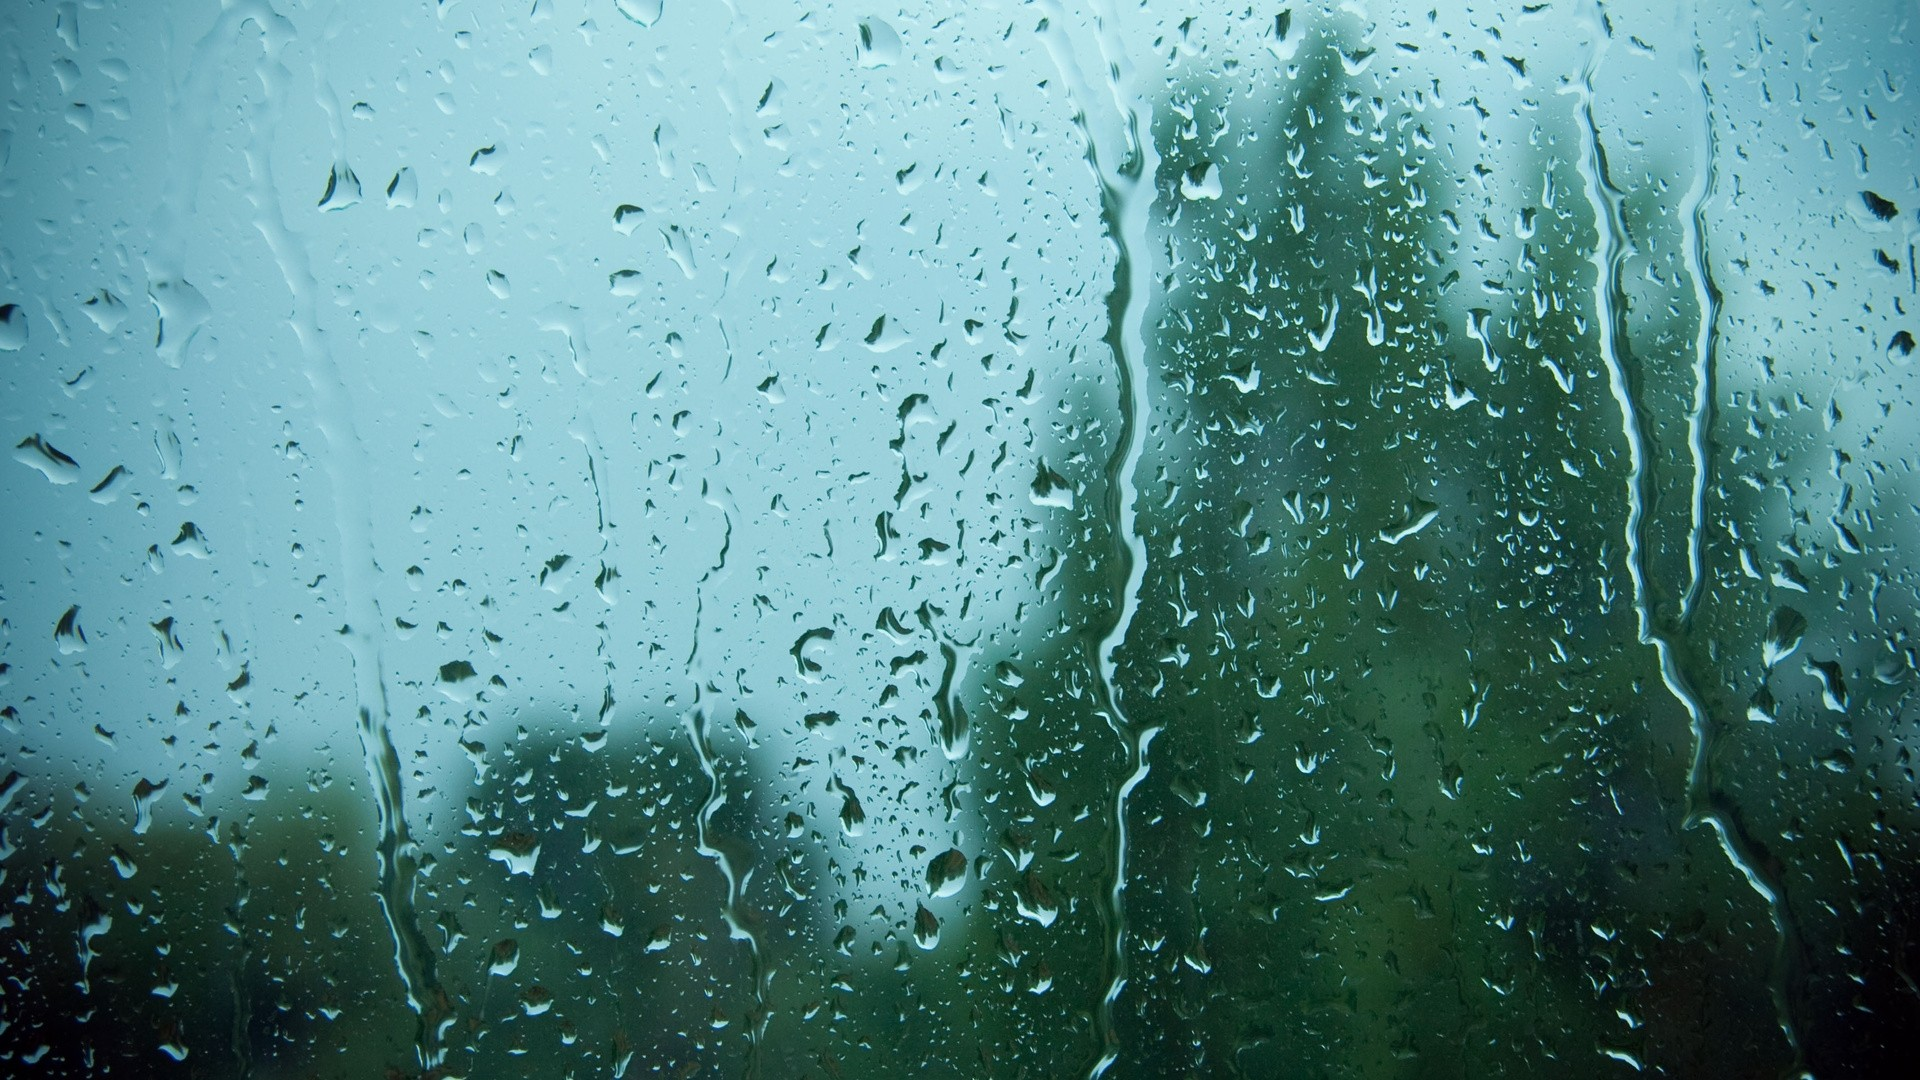 Rain Background Wallpaper